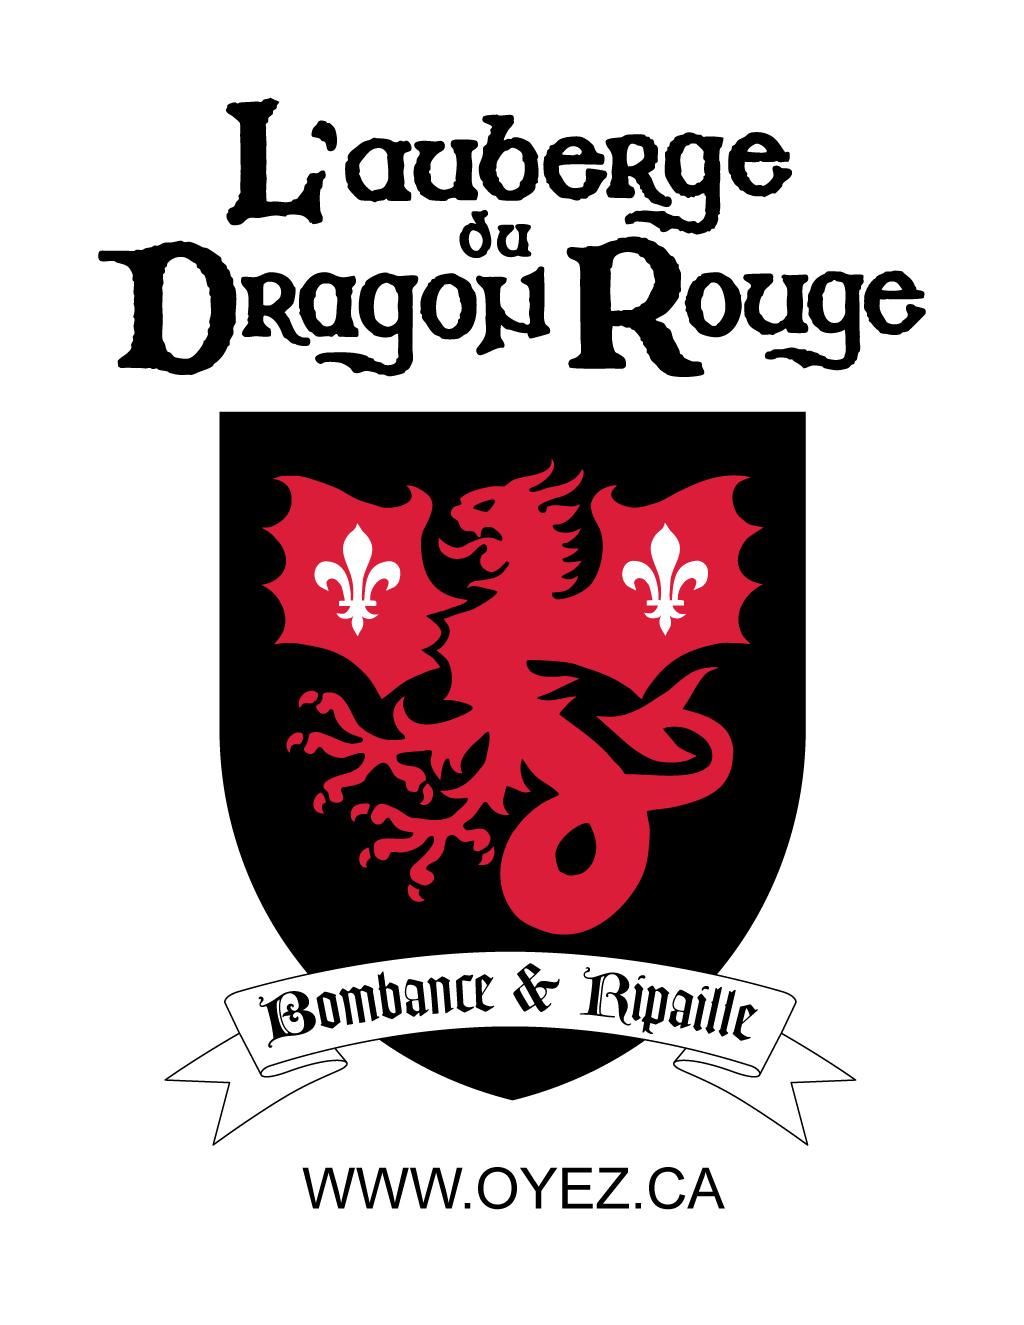 auberge-du-dragon-rouge